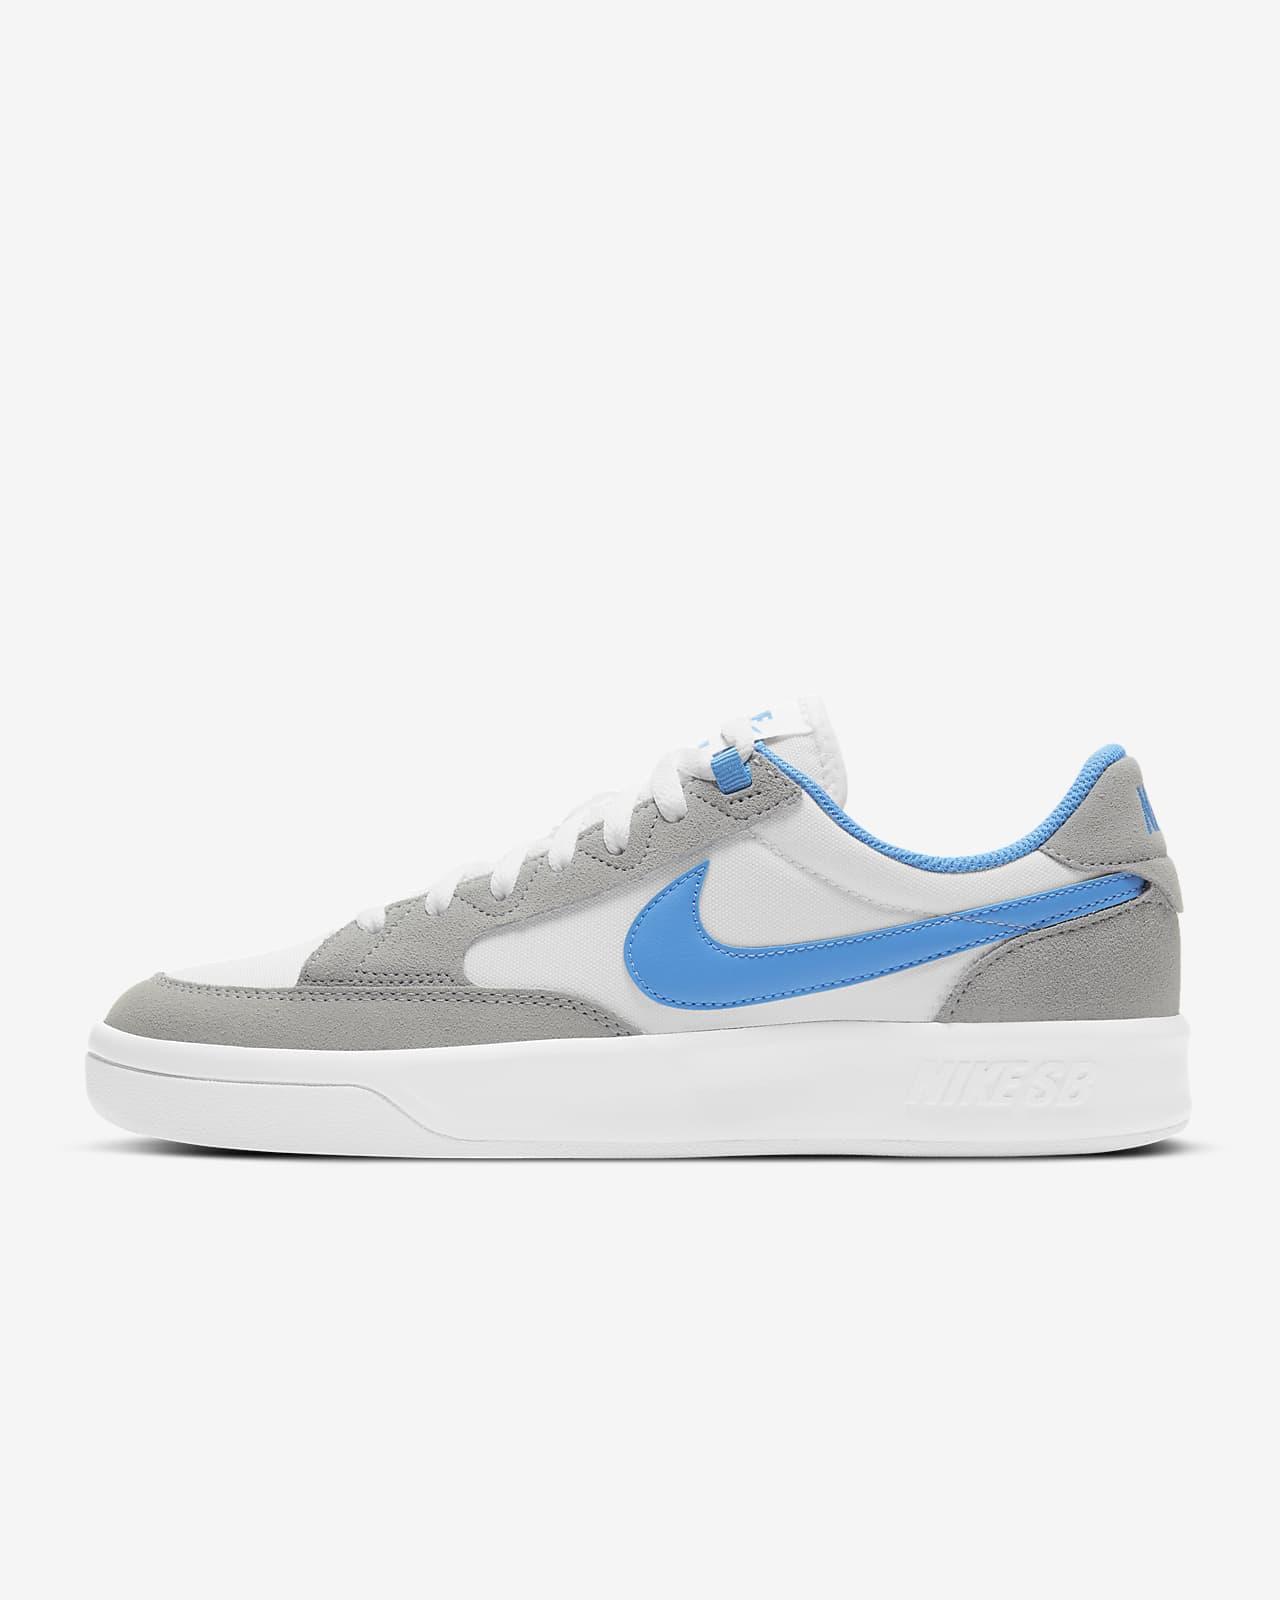 Nike SB Adversary Premium Skate Shoe